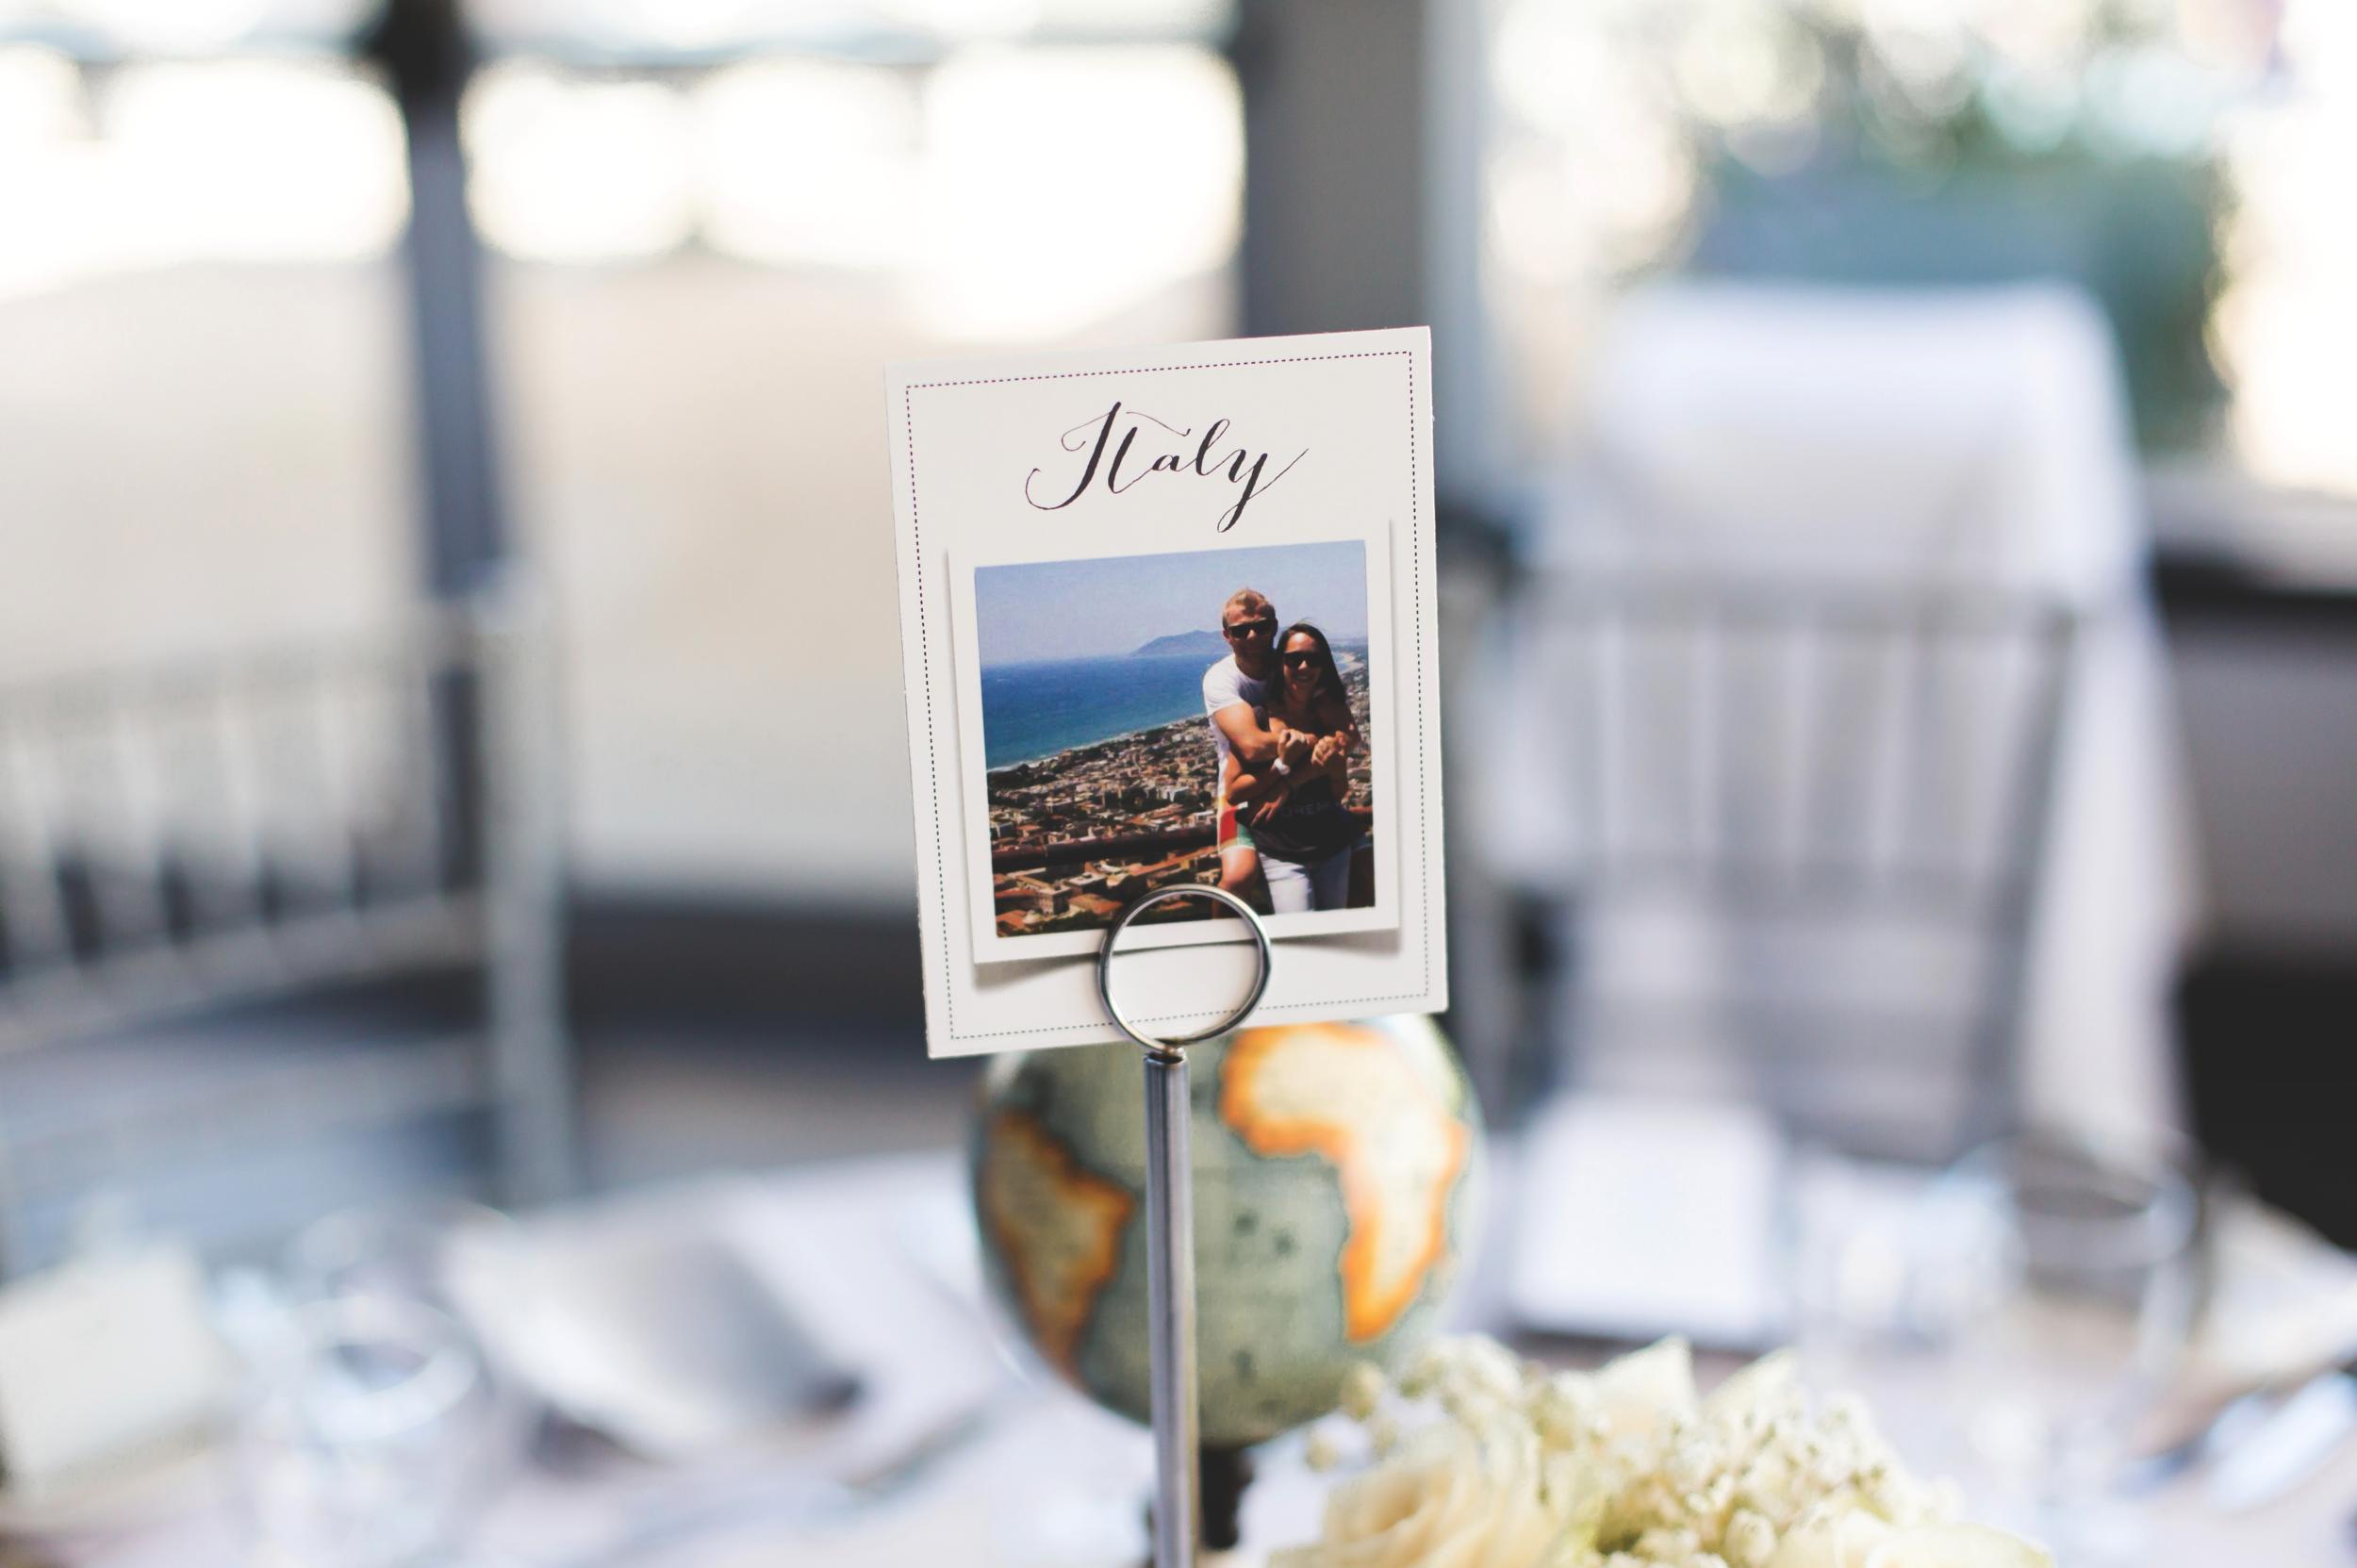 Wedding-Harbour-Banquet-Center-Oakville-Photographer-Wedding-Hamilton-Saint-James-Espresso-Downtown-HamOnt-GTA-Niagara-Toronto-Moments-by-Lauren-Photography-Photo-Image-46.png